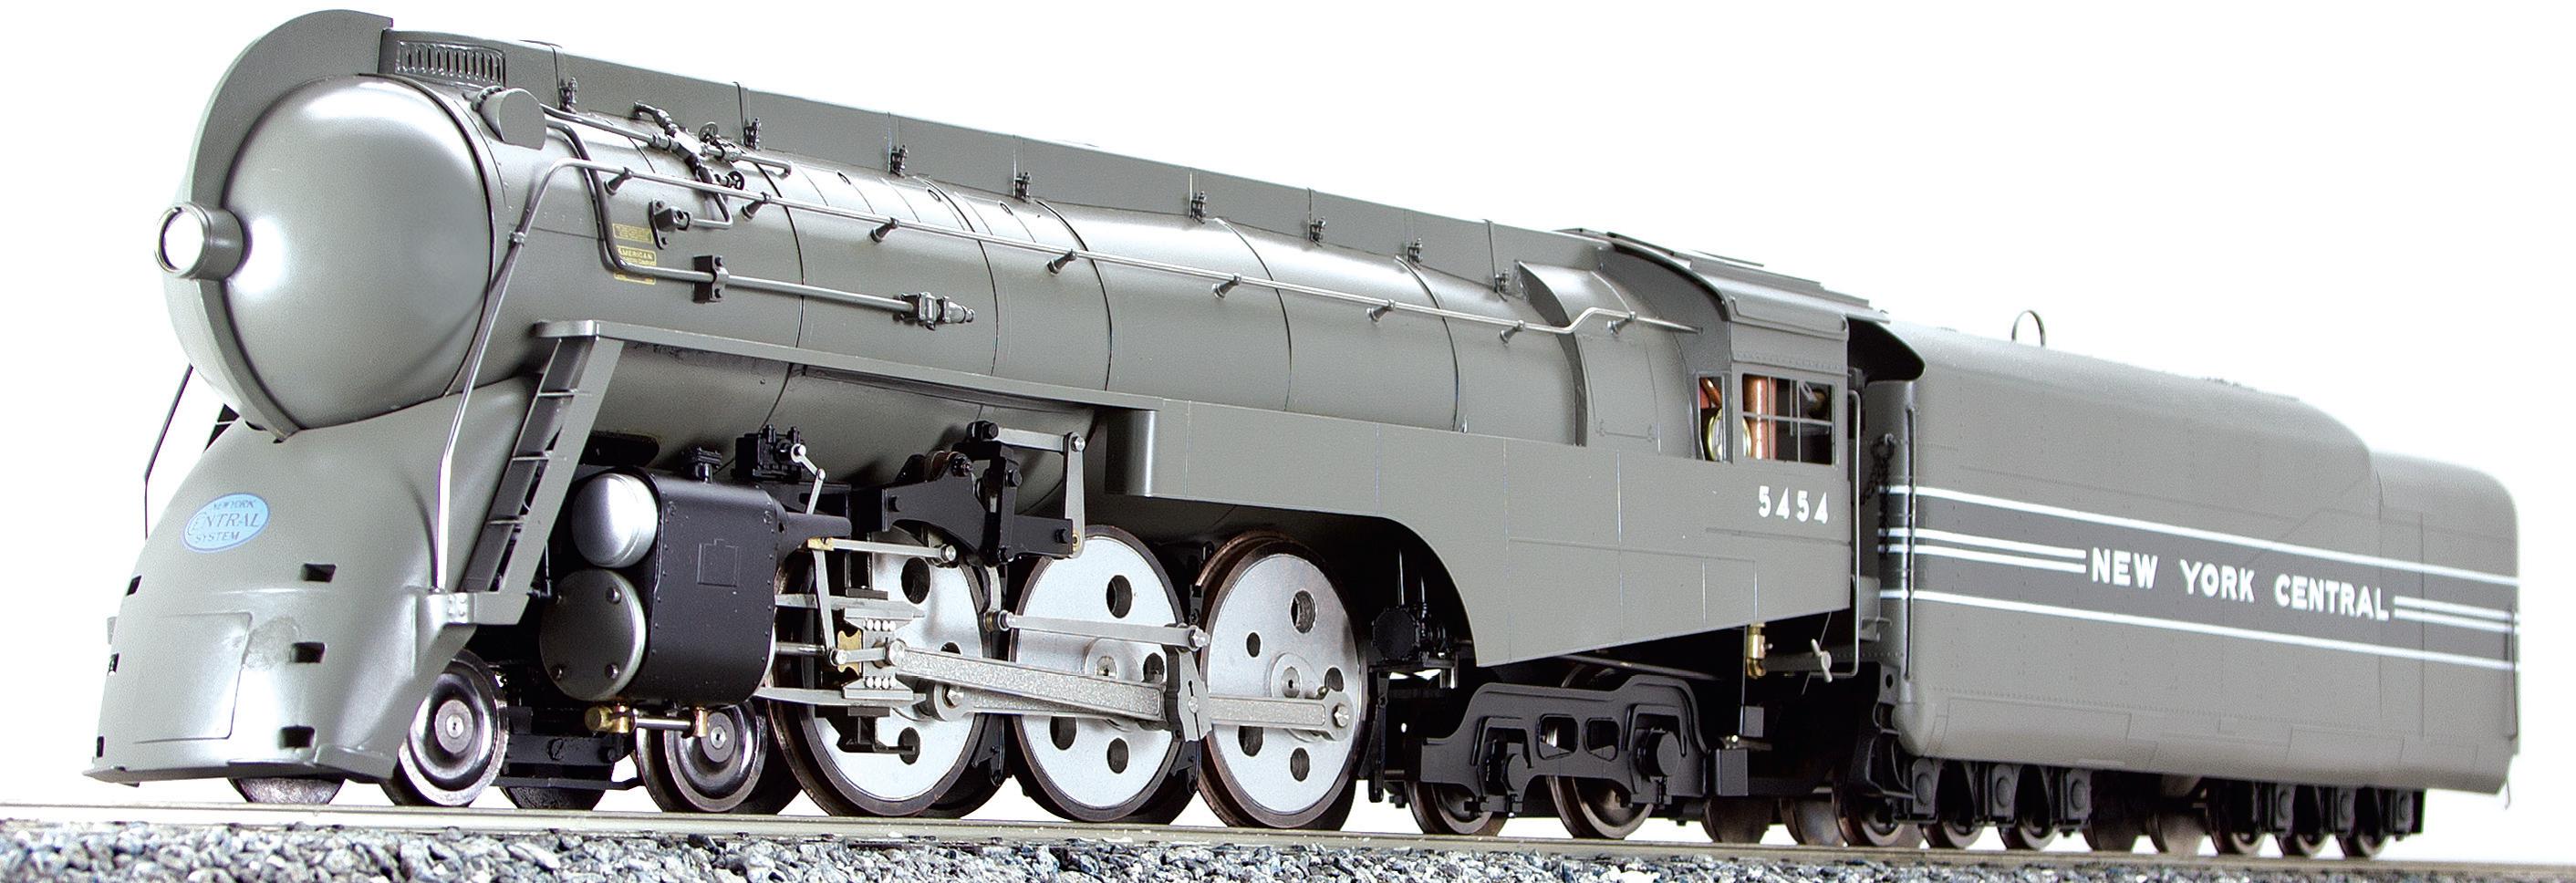 Pics For > Henry Dreyfuss Train Henry Dreyfuss Train